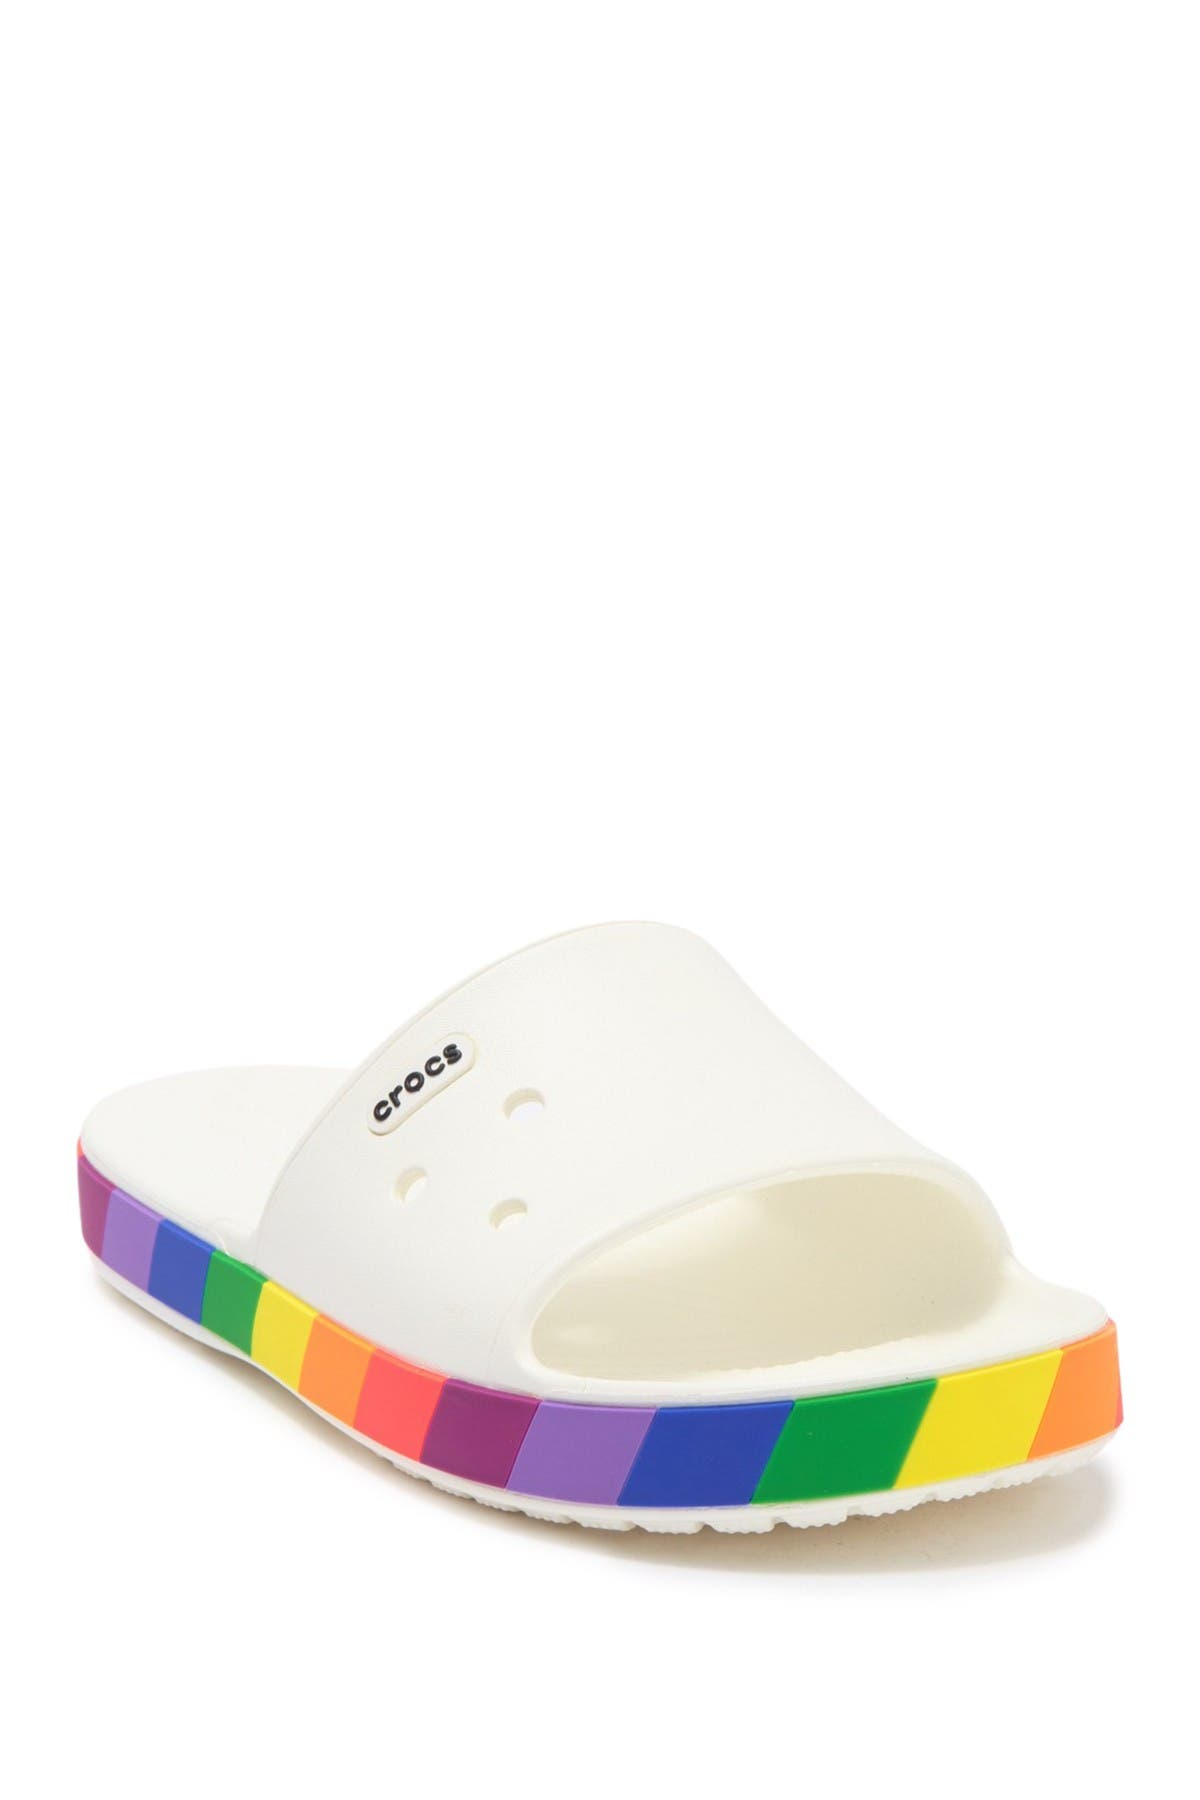 Image of Crocs Crocband III Rainbow Block Slide Sandal